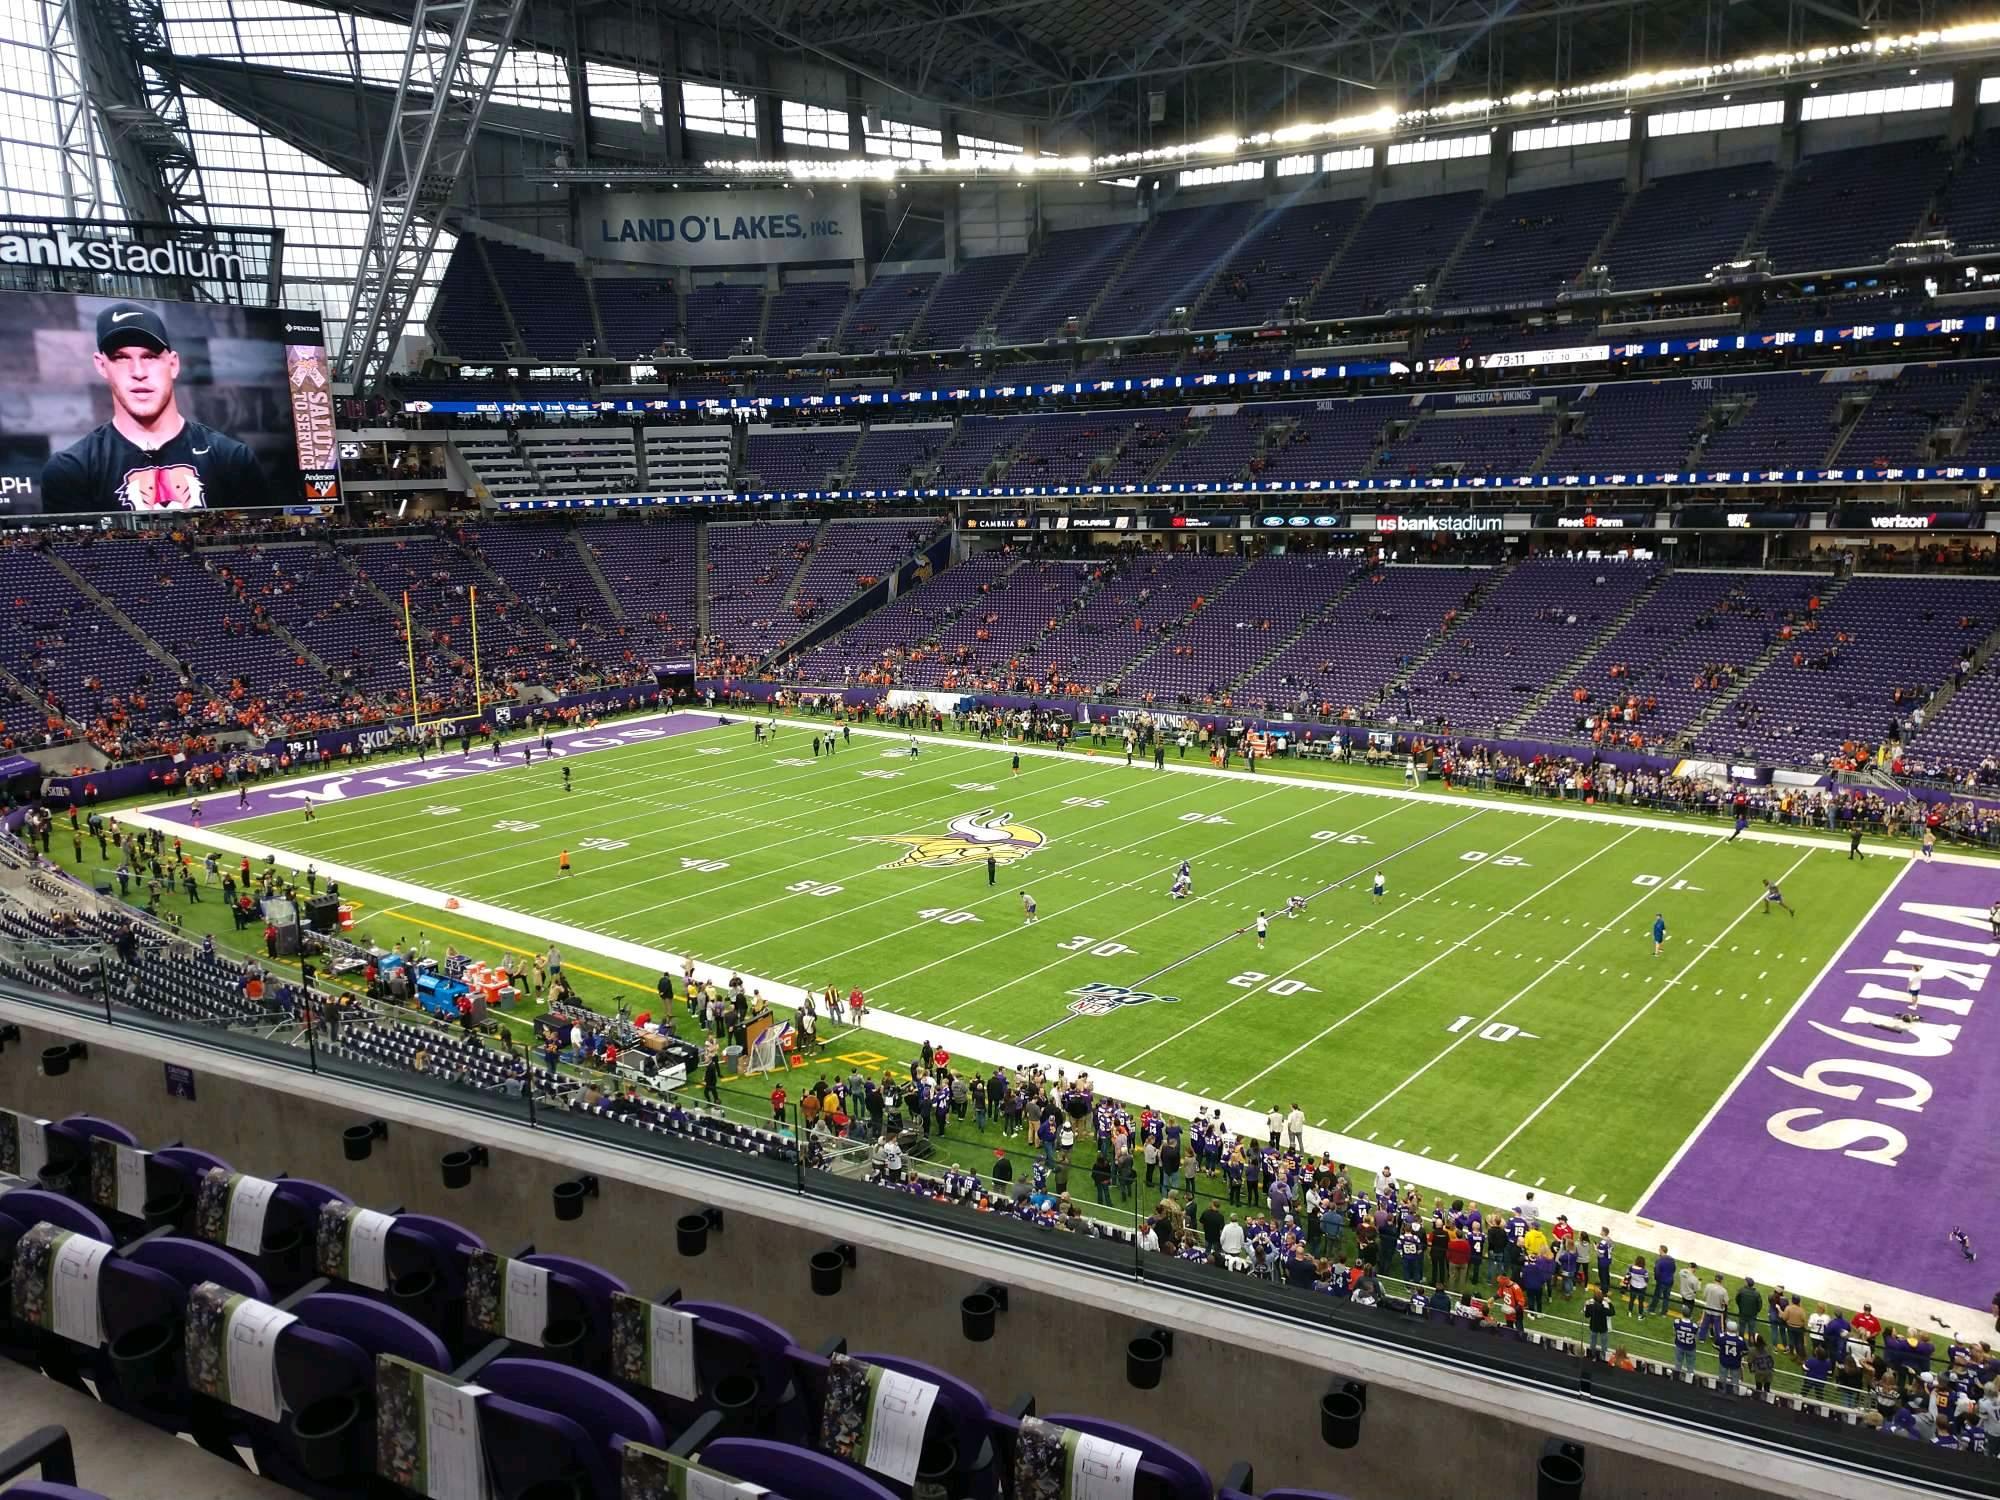 U.S. Bank Stadium Section 229 Row 4 Seat 4